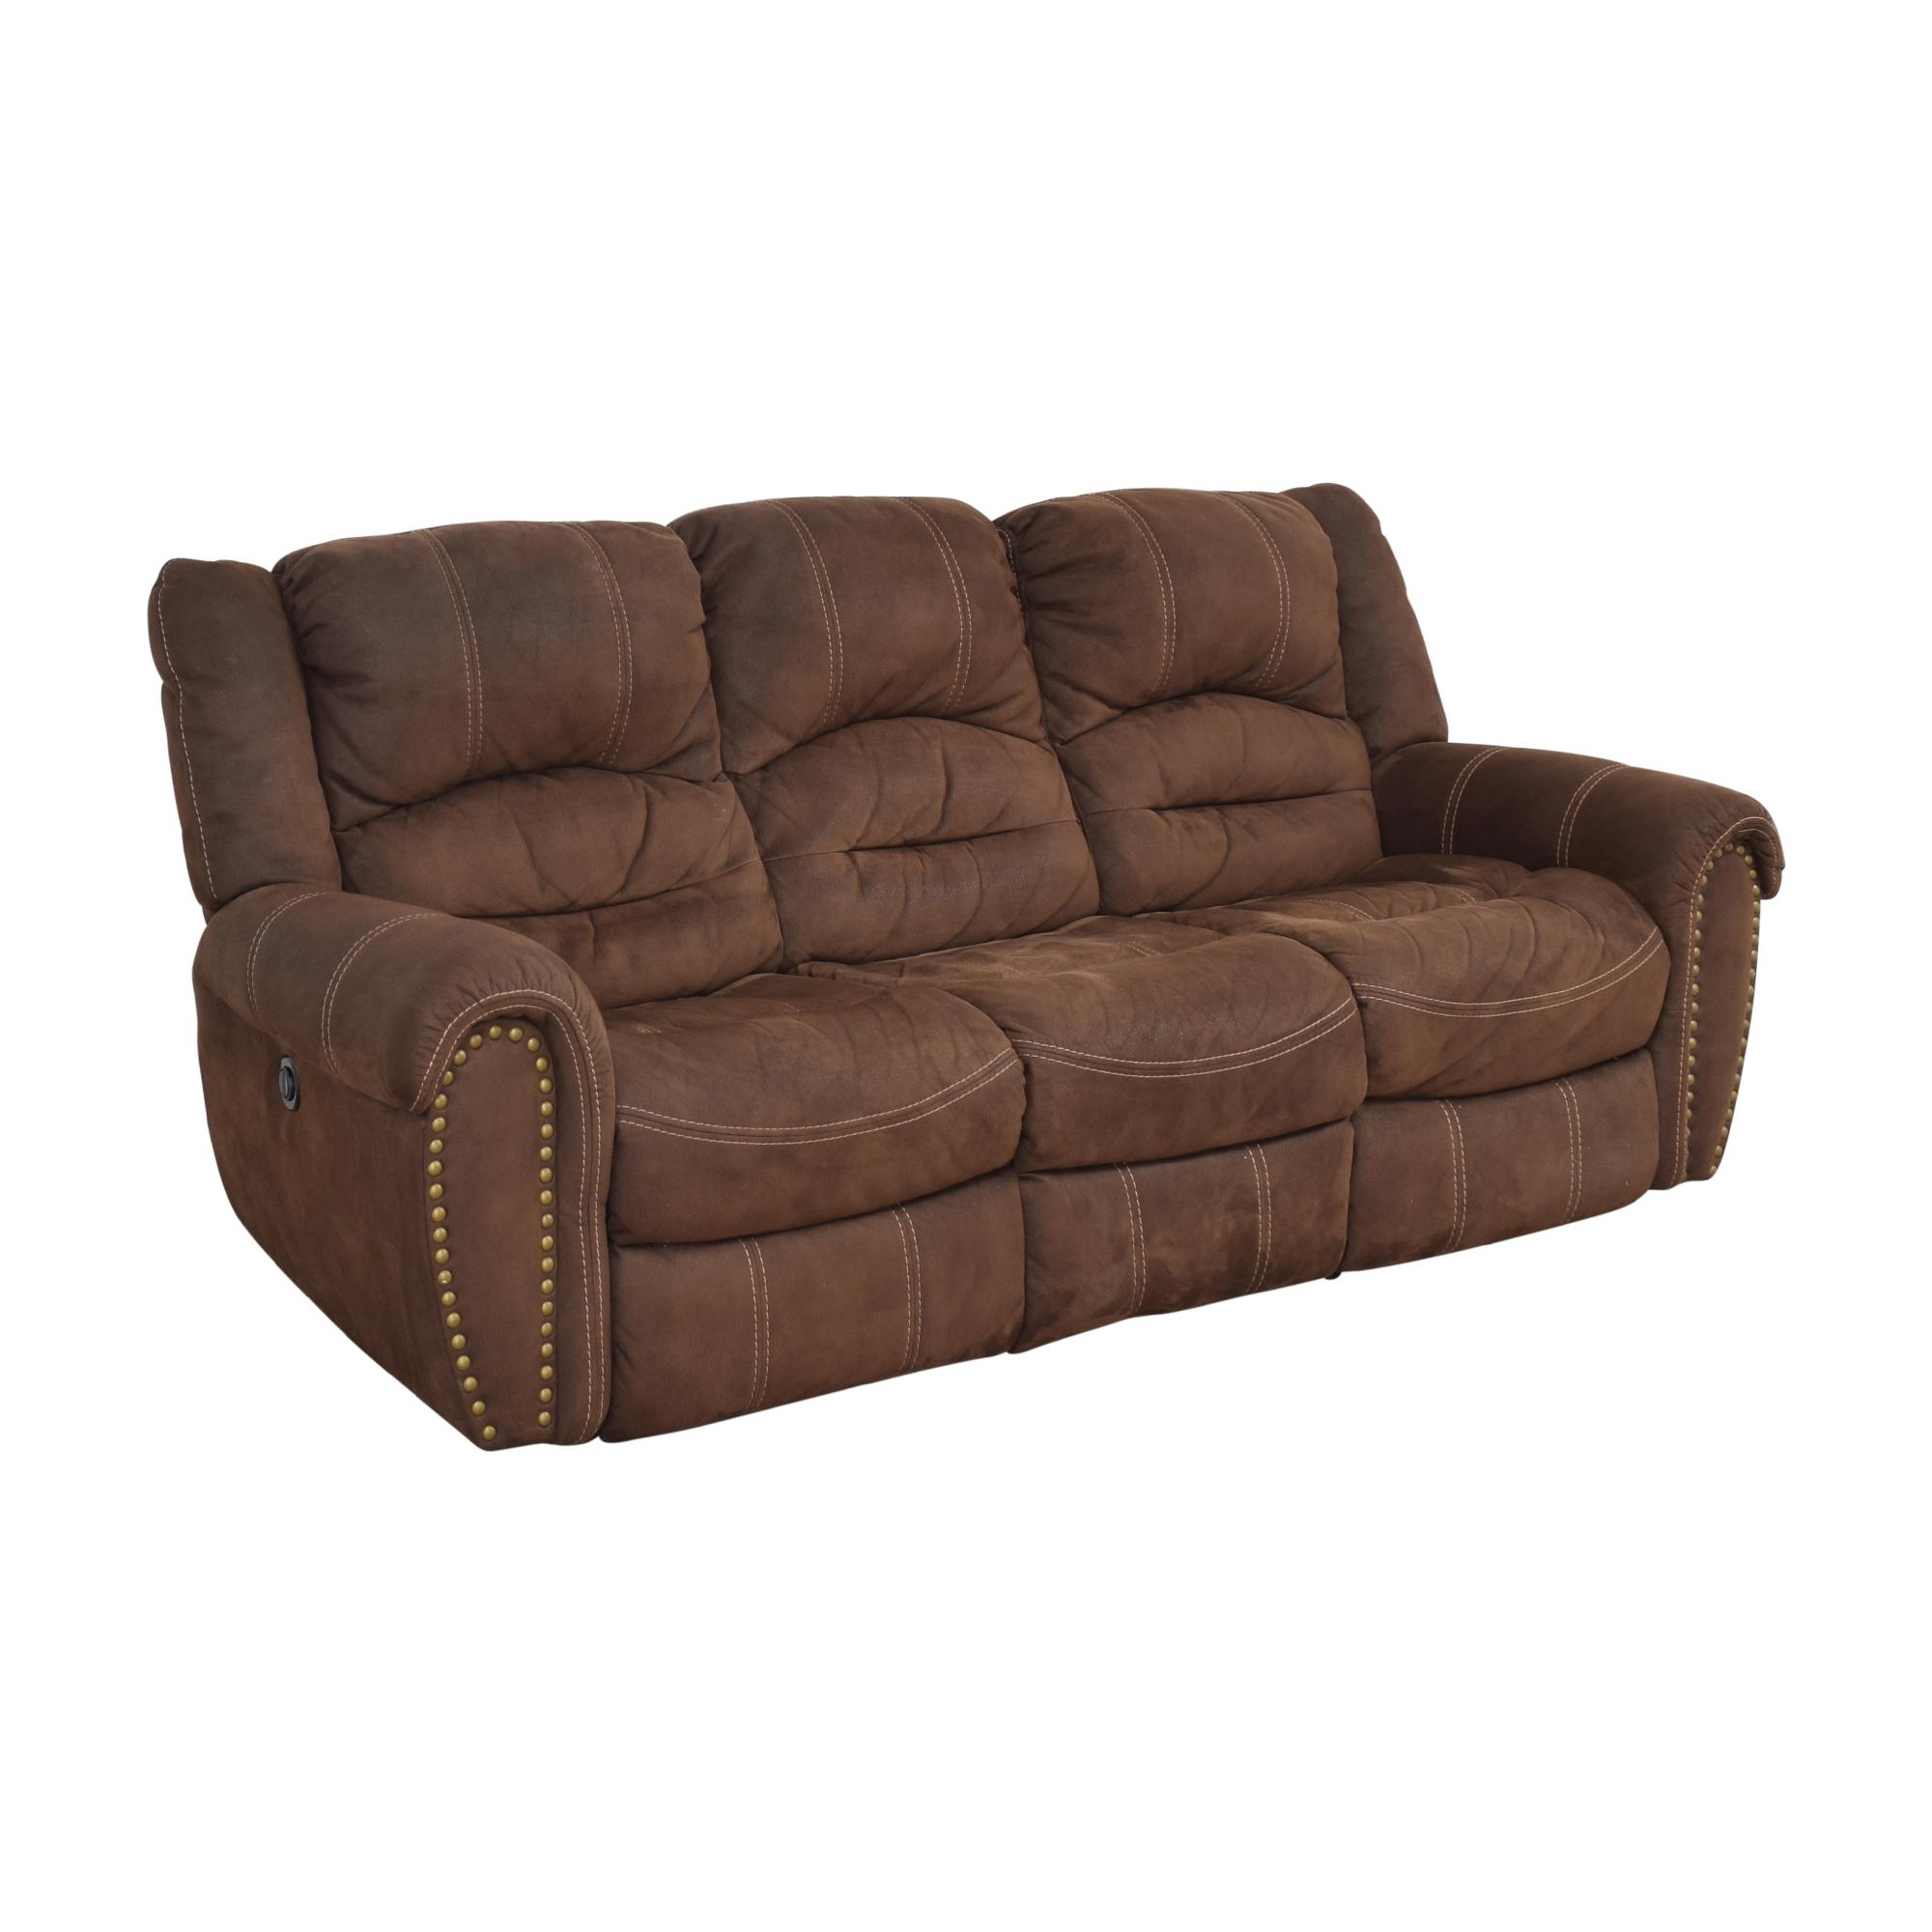 Flexsteel Flexsteel Town Nailhead Reclining Sofa on sale